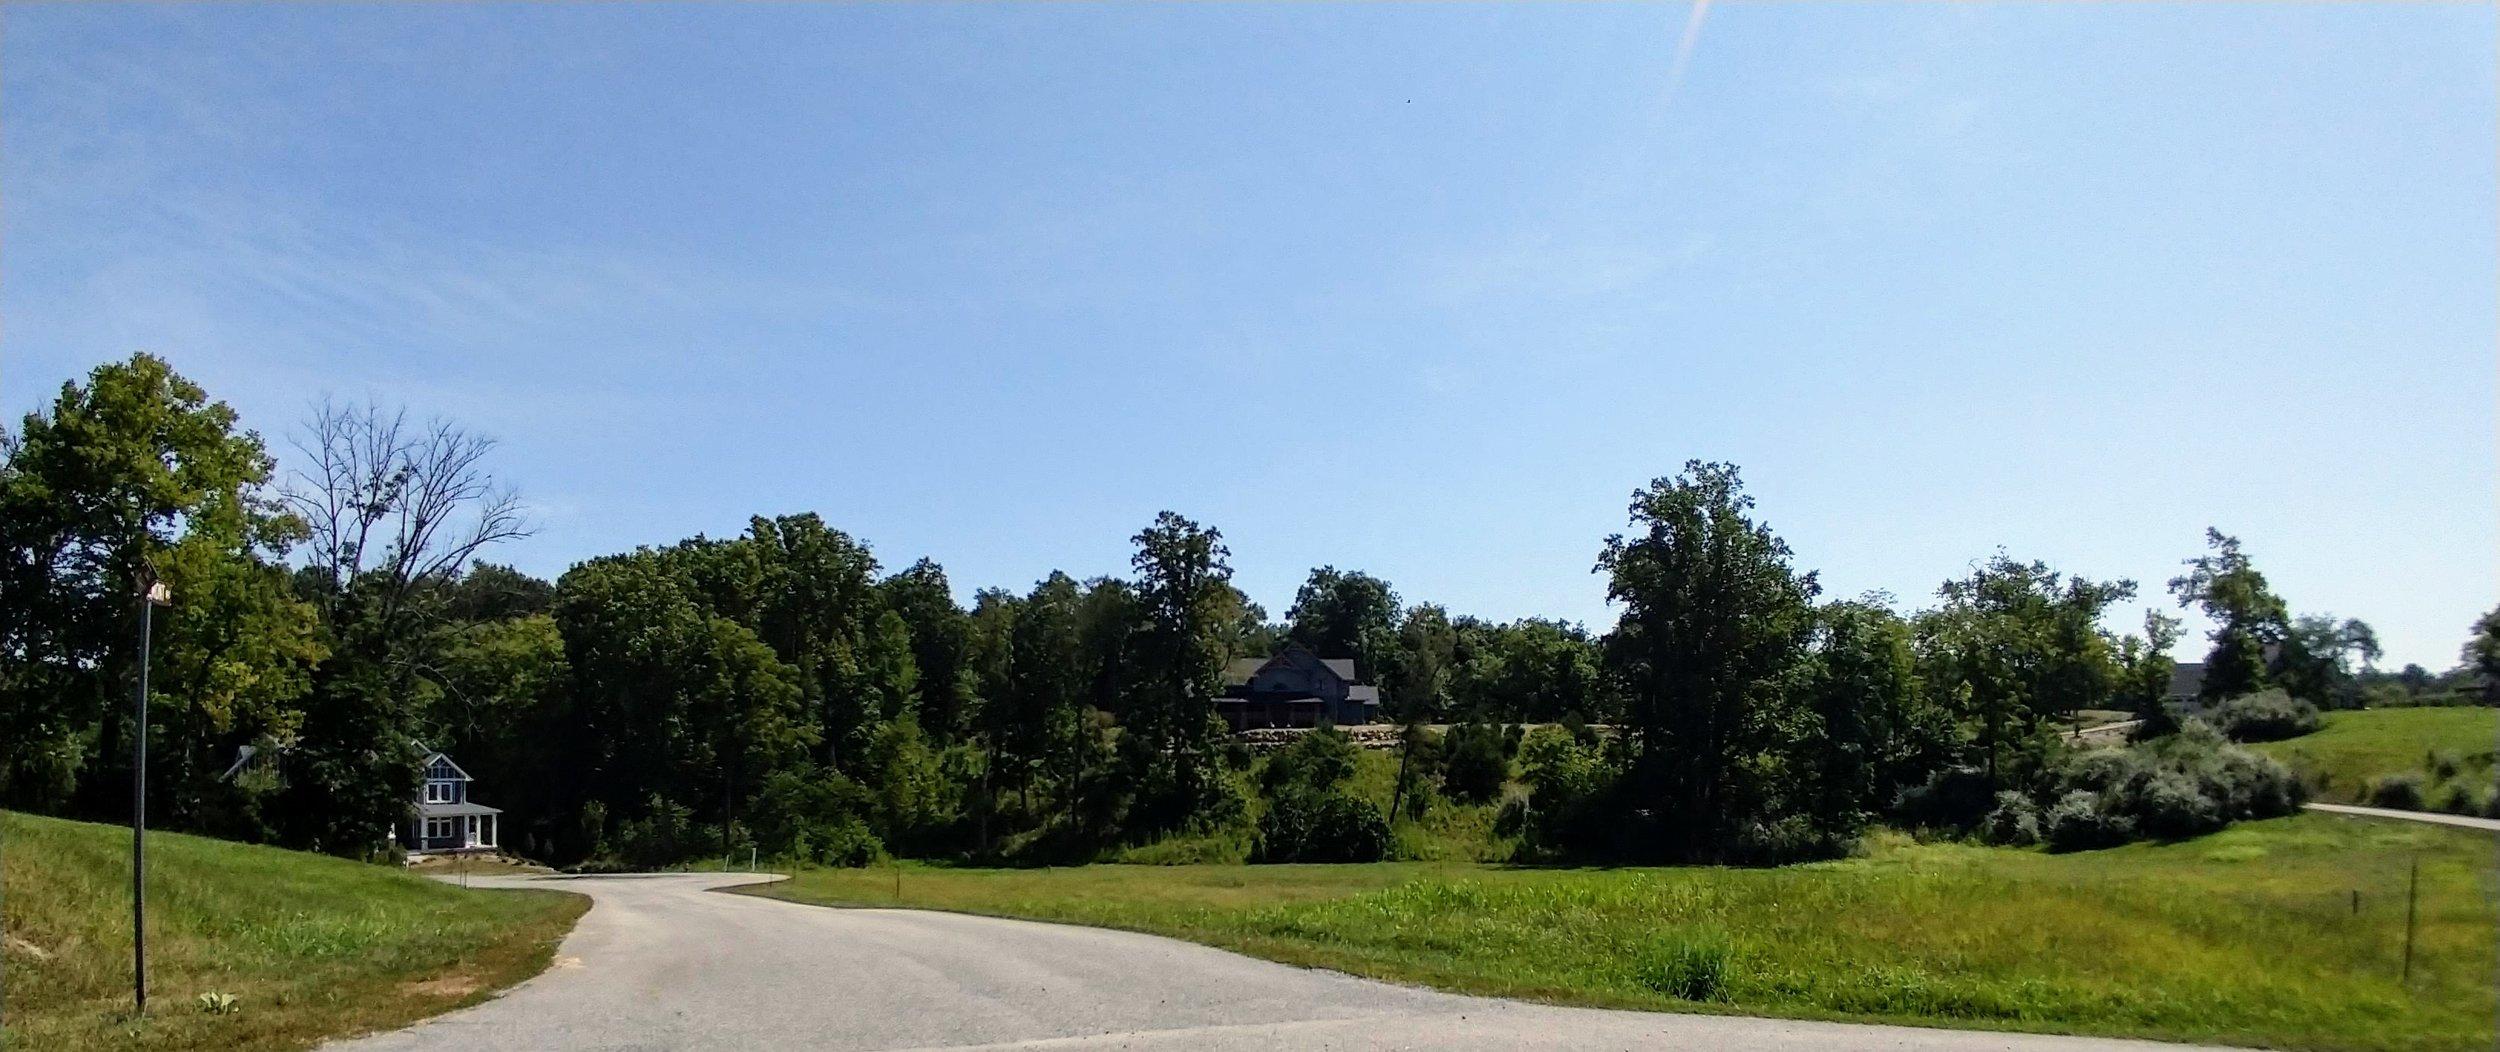 Down North Ridgemont Drive toward #17